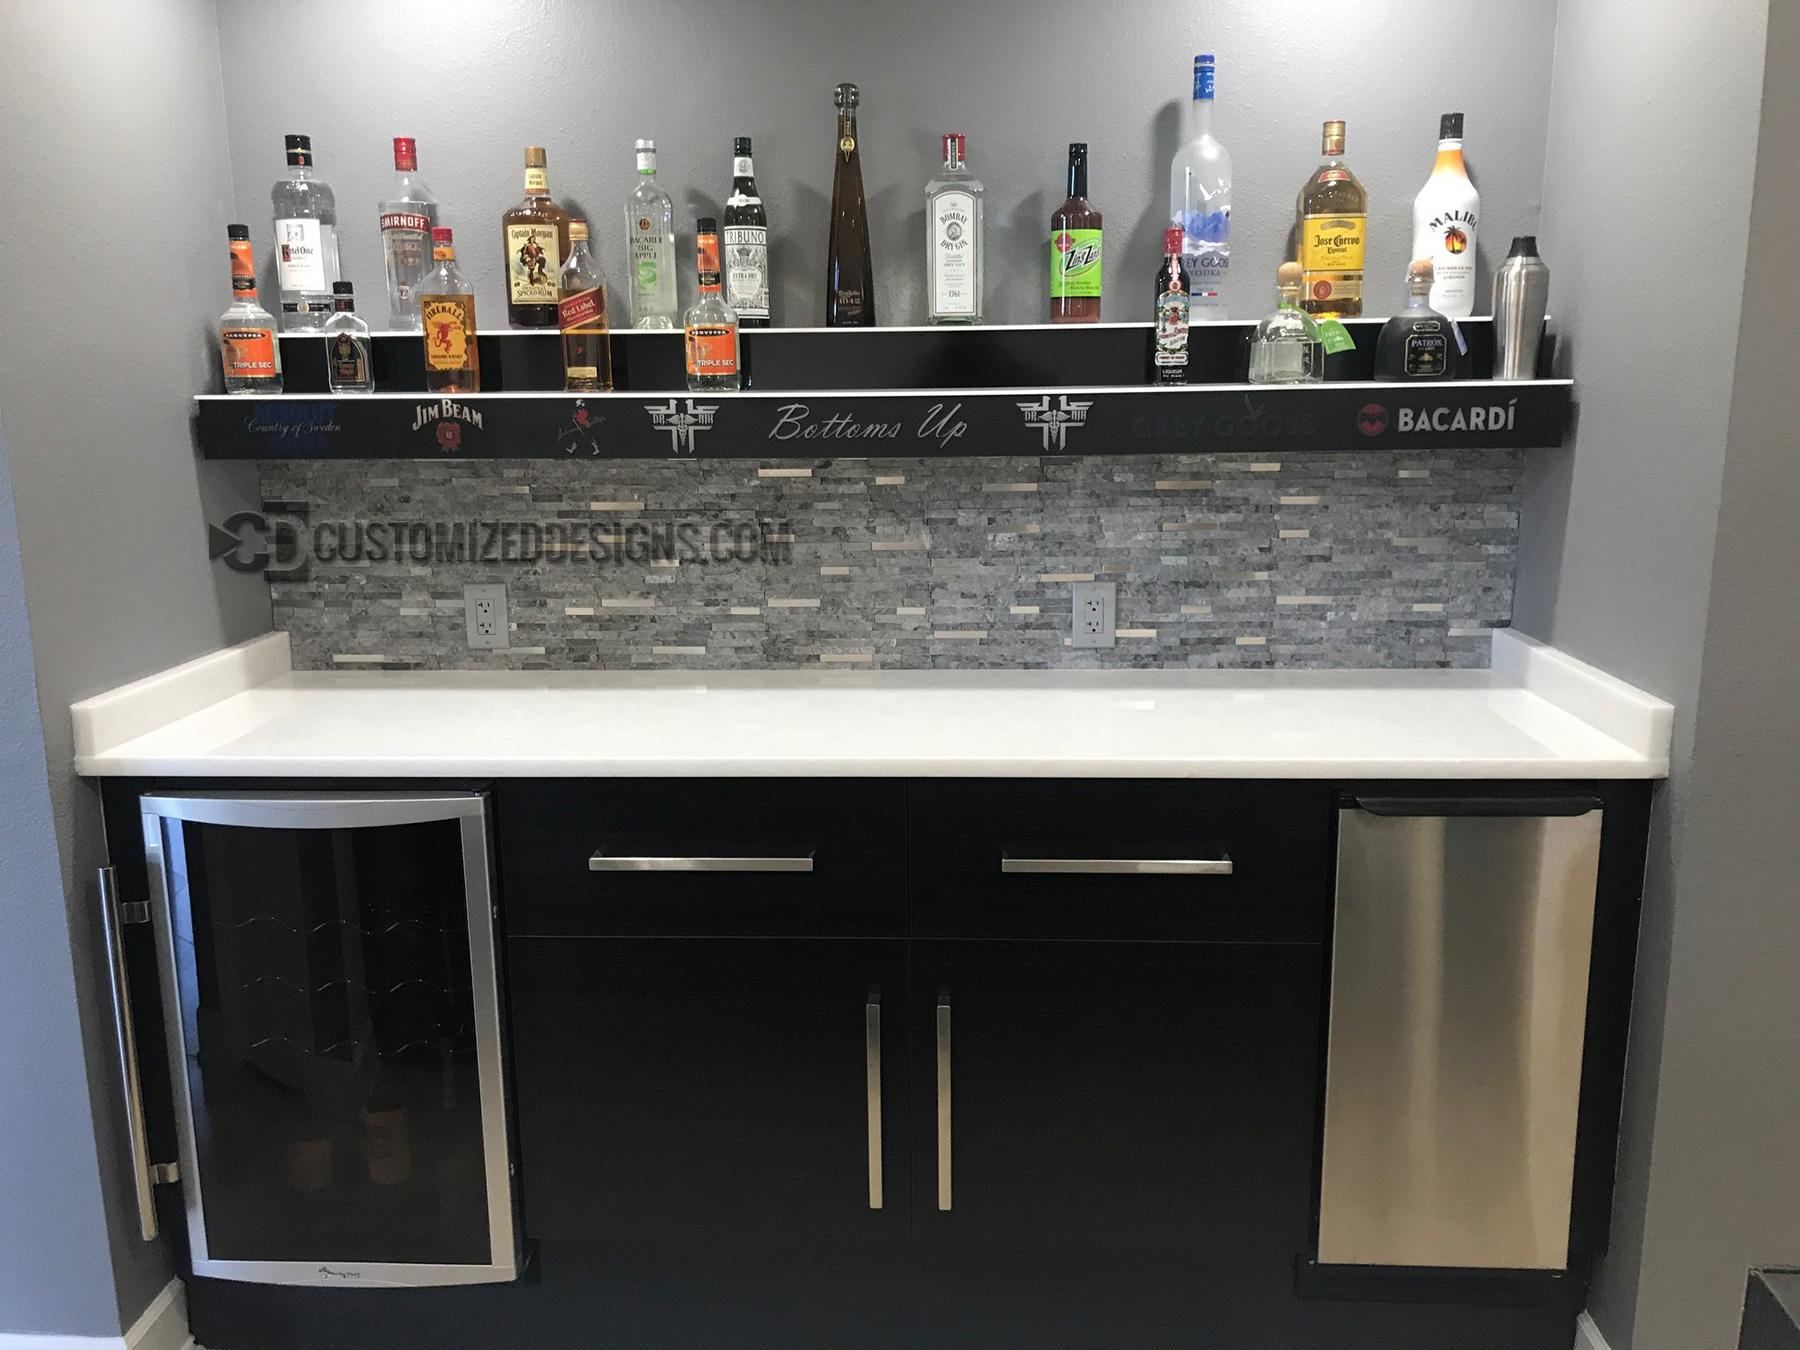 Led Lighted Liquor Shelves Amp Illuminated Home Bar Displays